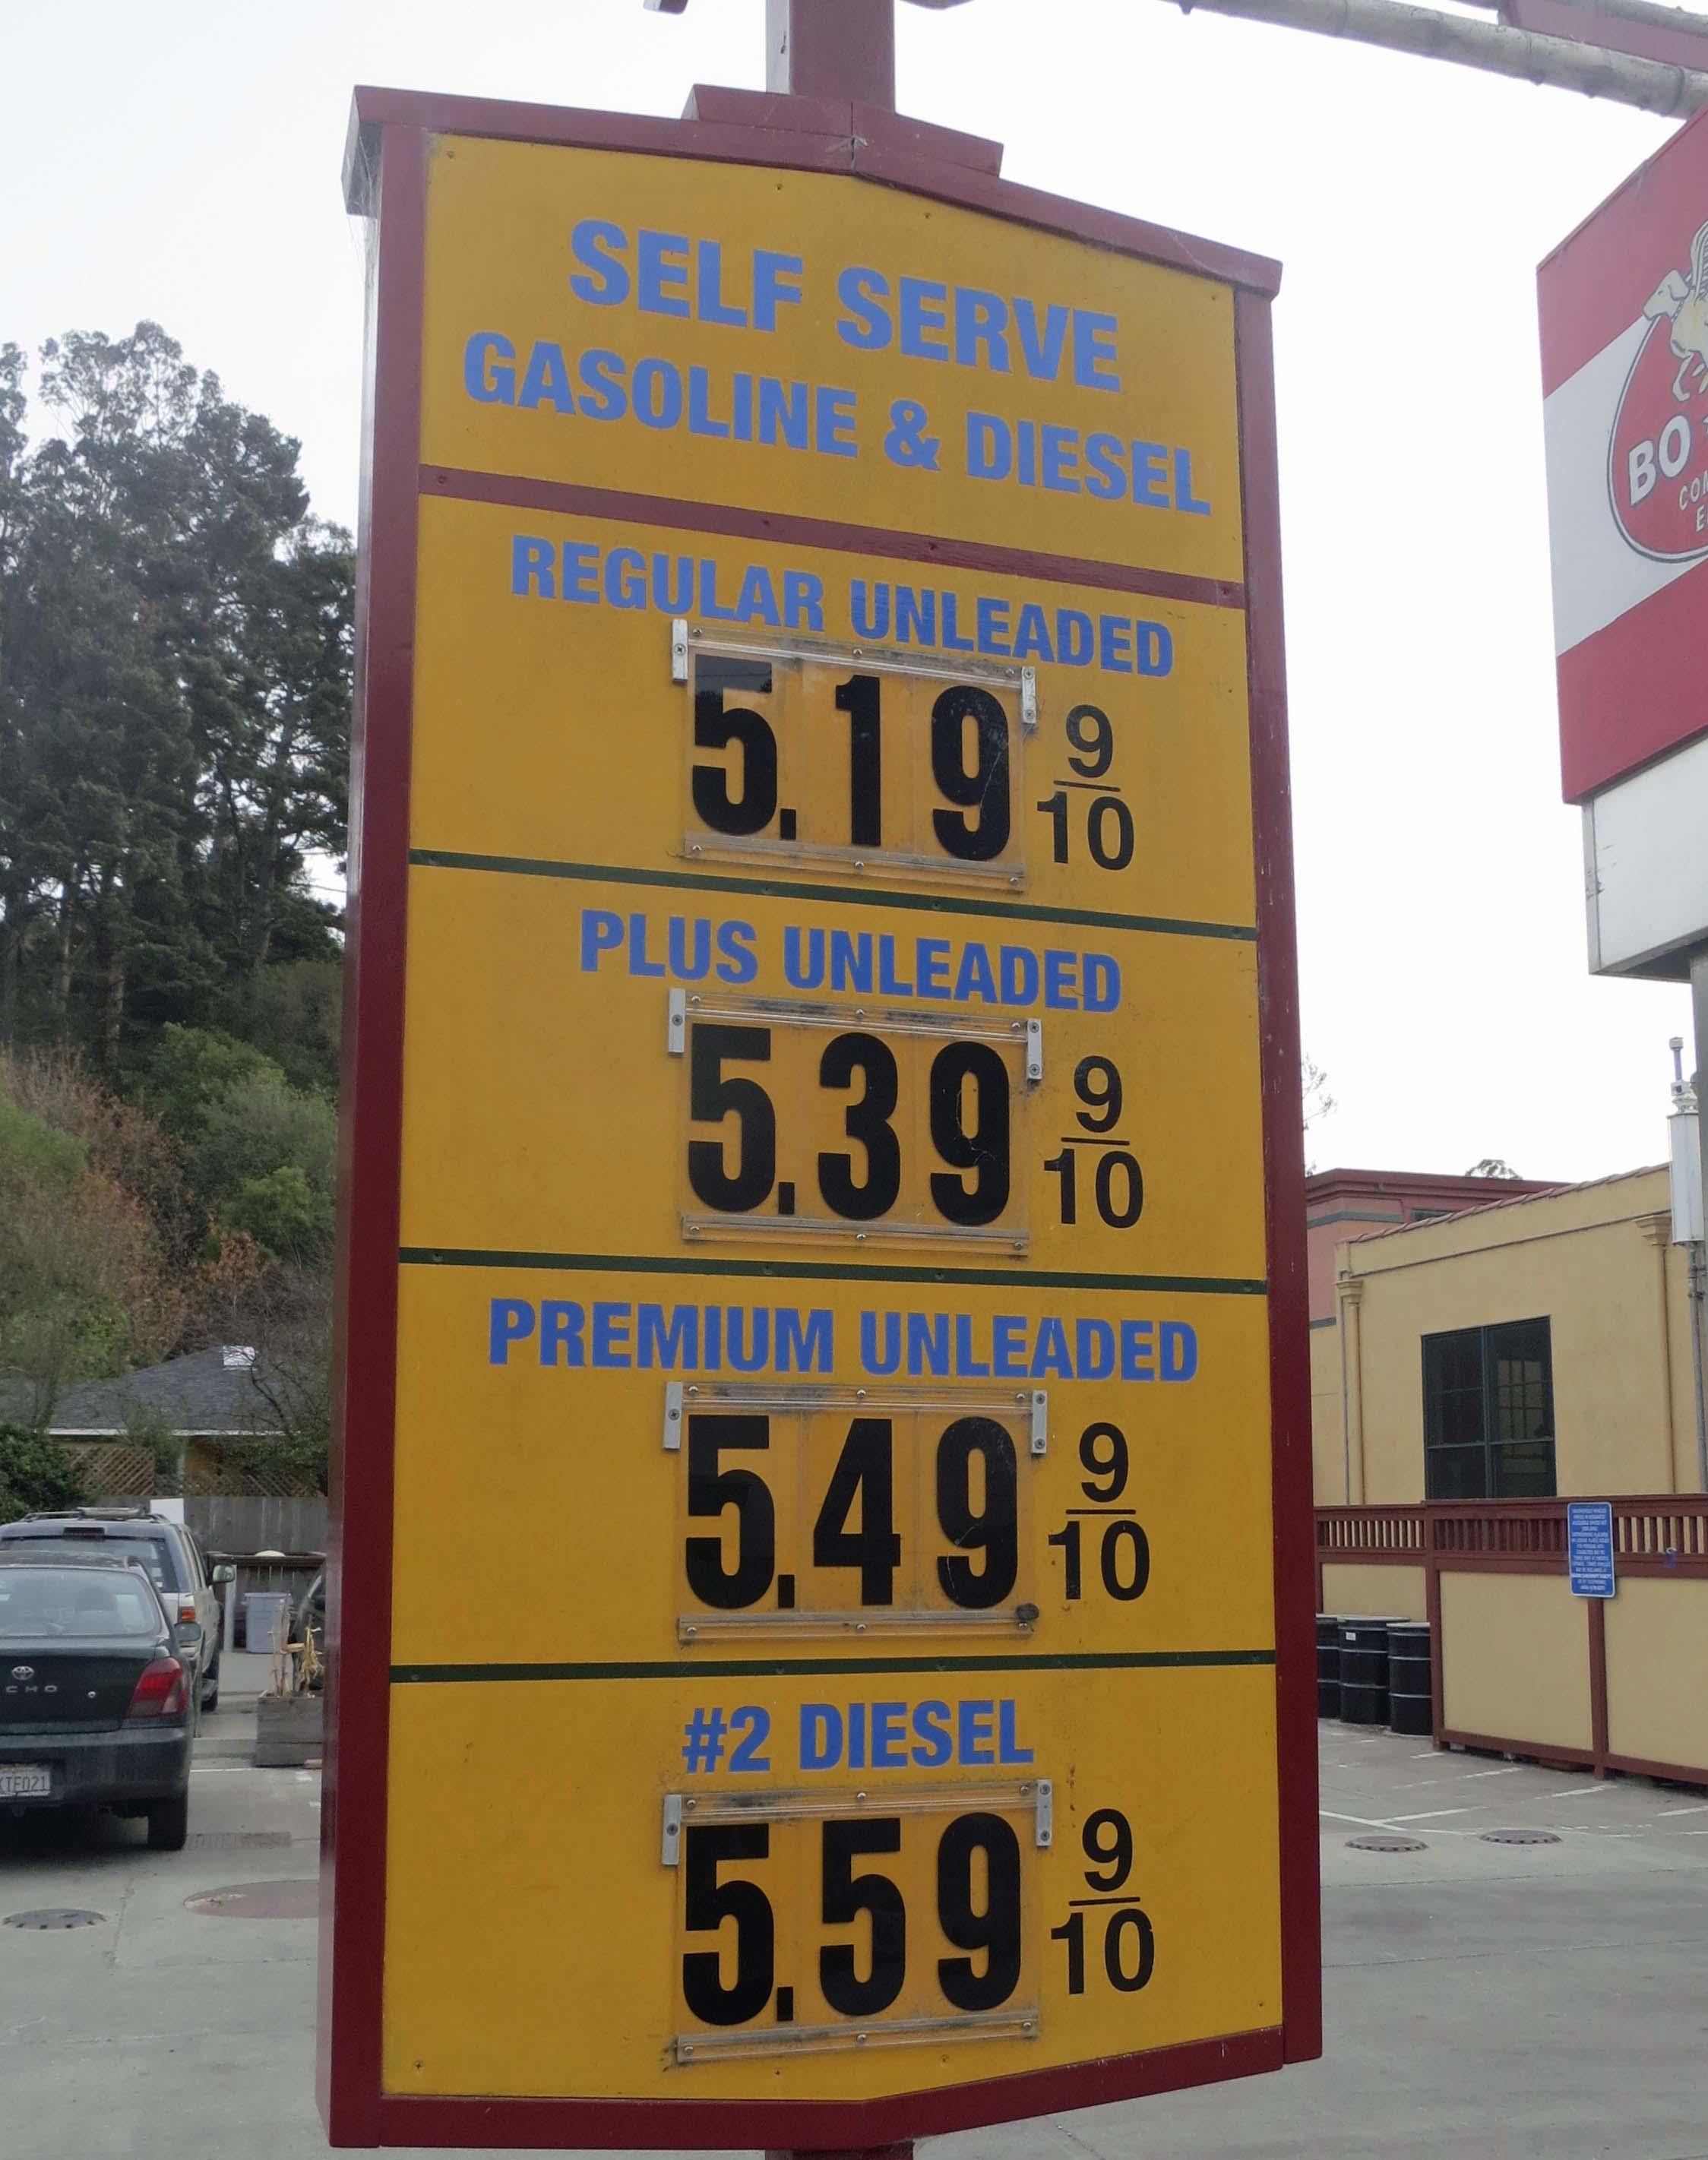 2013 gas prices in Bolinas, California. Photo by Curtis Mekemson.